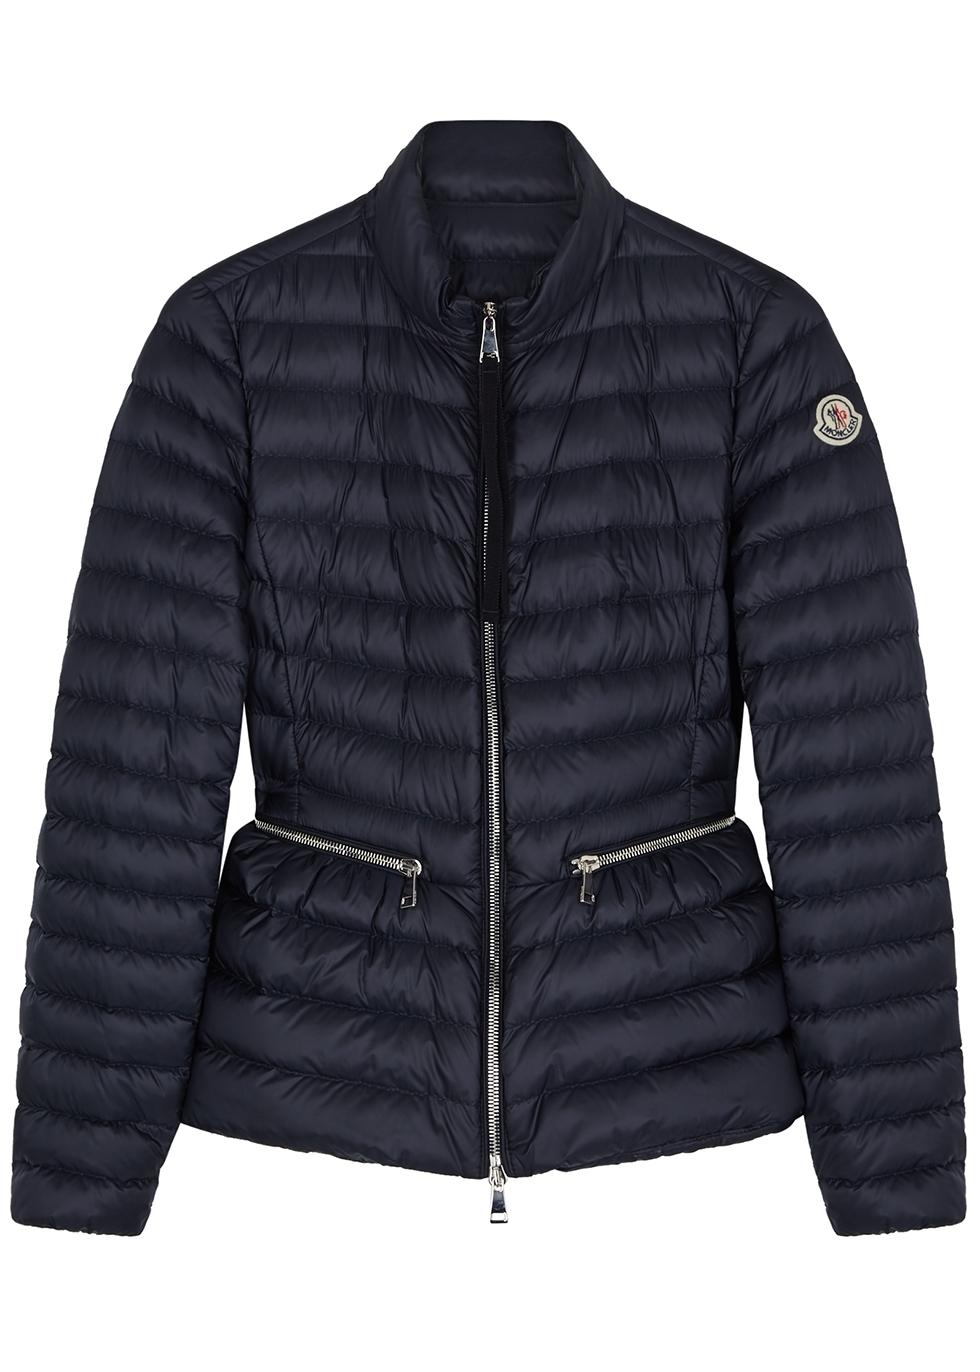 6e9b43bd1 Moncler - Designer Jackets, Coats, Gilets - Harvey Nichols